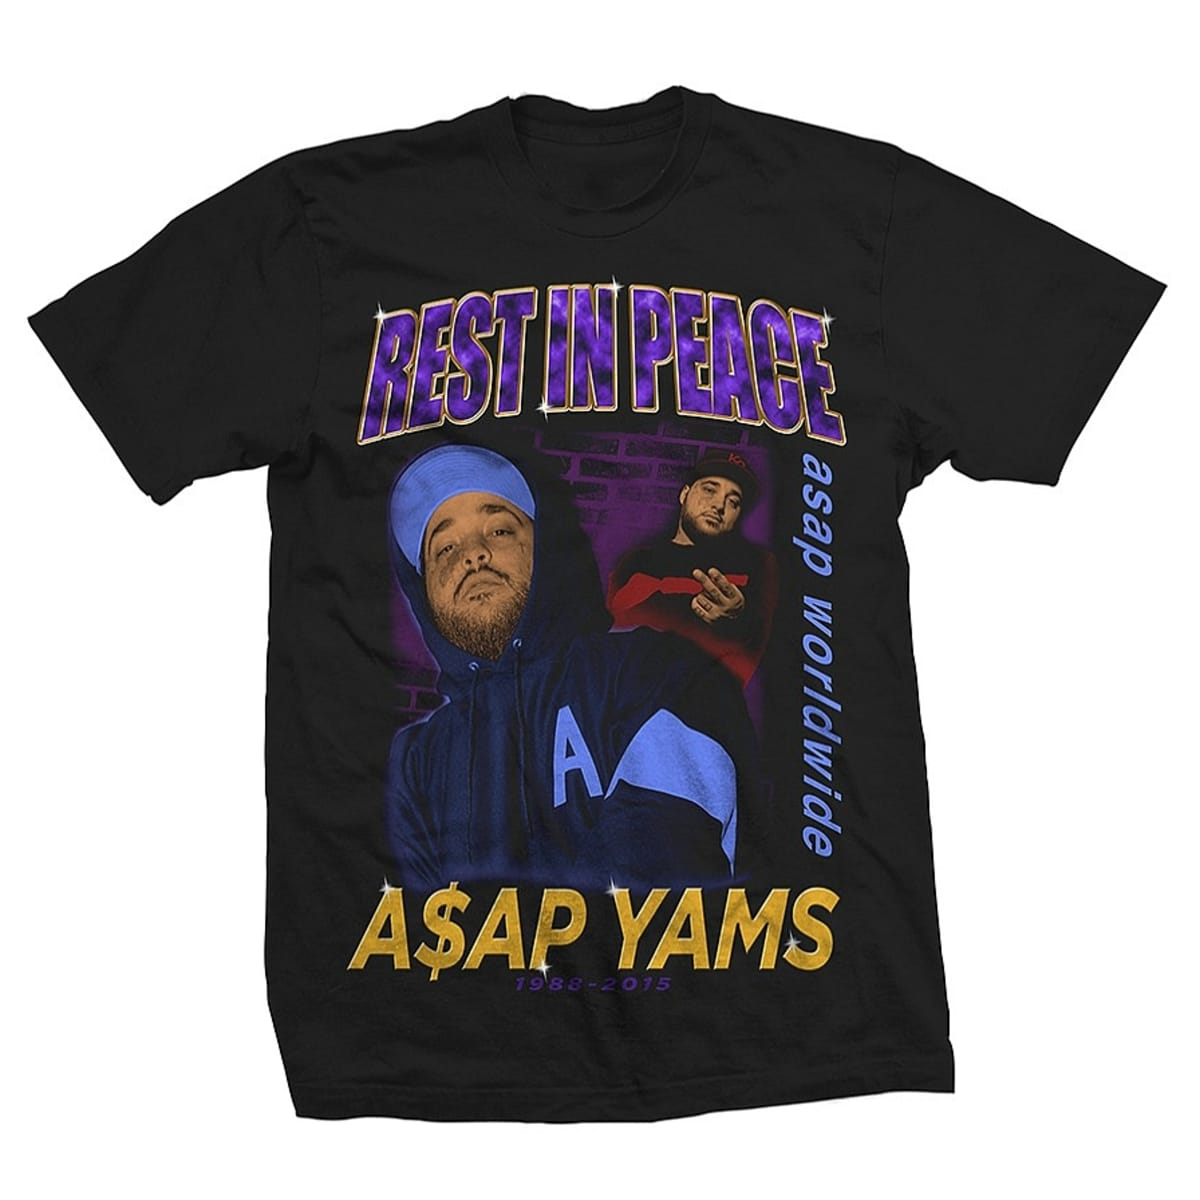 A$AP Mob Selling A$AP Yams T-Shirt | Complex